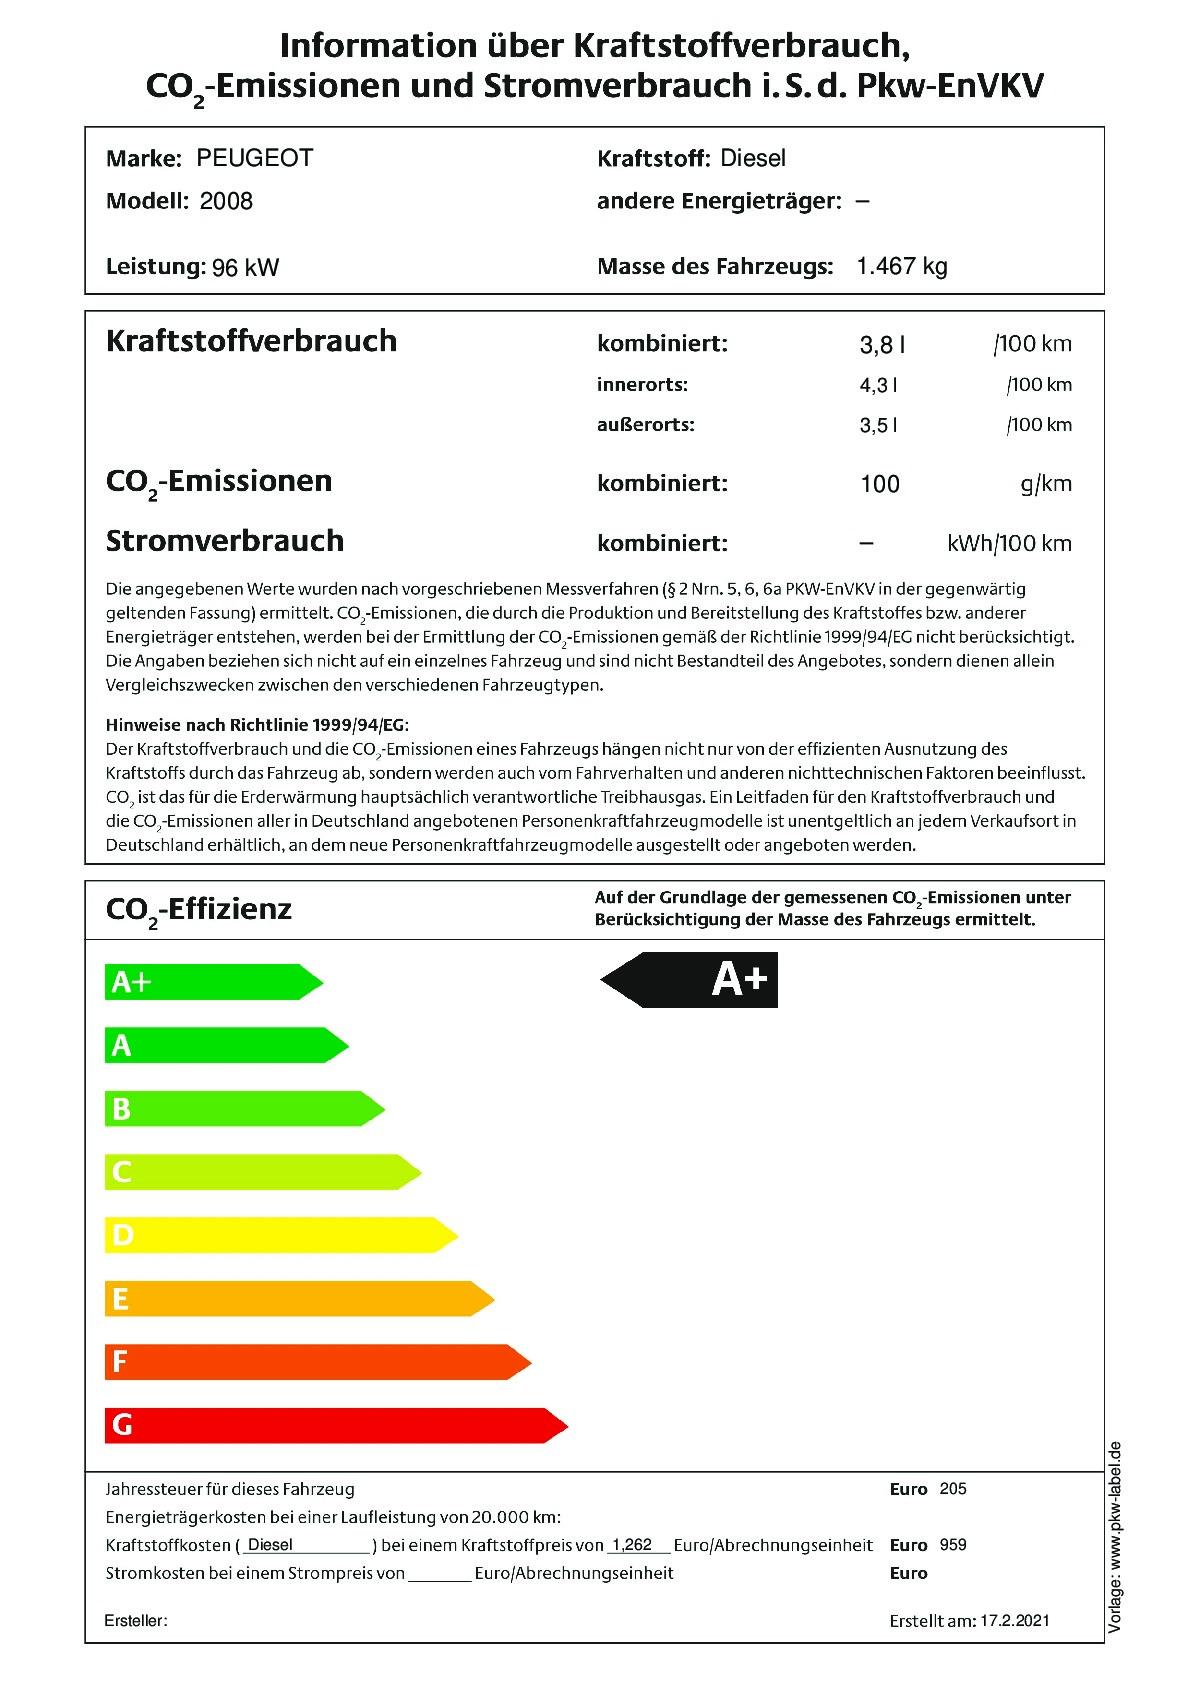 Energielabel 1.5 BlueHDI 130 S&S EAT8